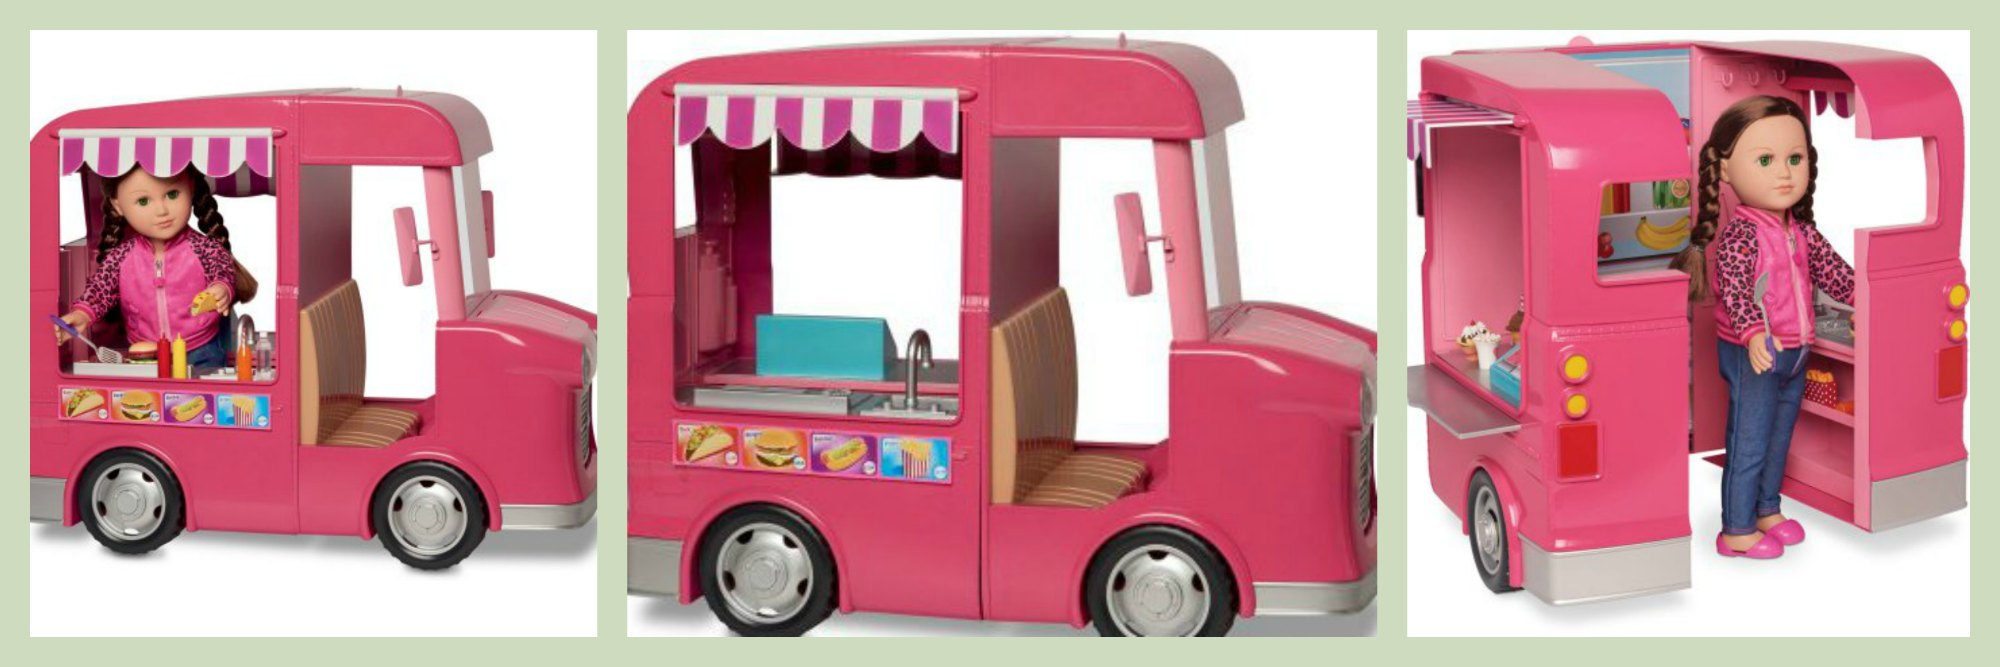 My Life As Dolls Food Truck